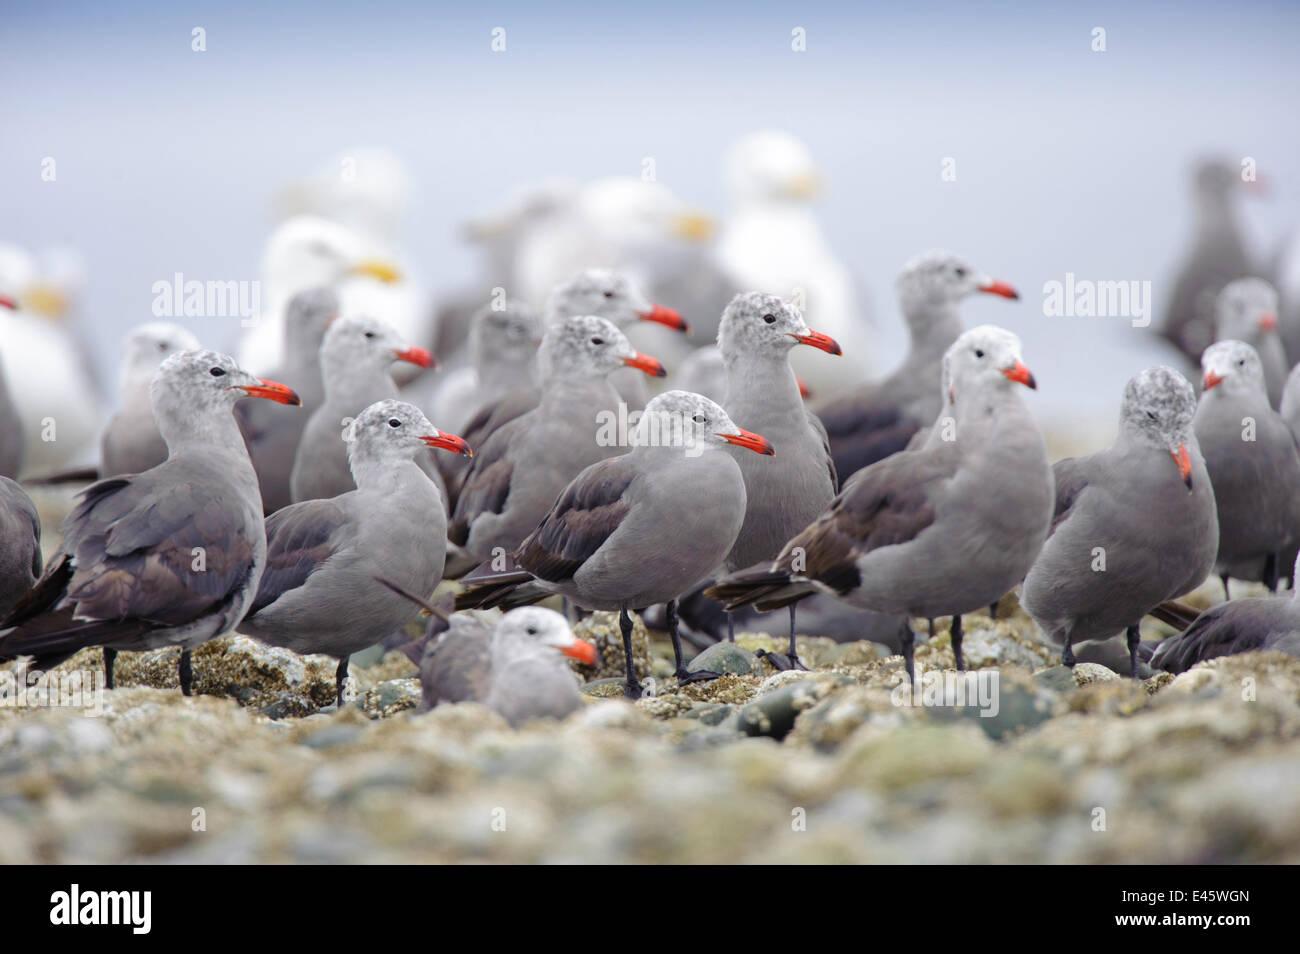 Flock of Heermann's Gulls (Larus heermanni) standing on intertidal rocks. Jefferson County, Washington, USA, - Stock Image